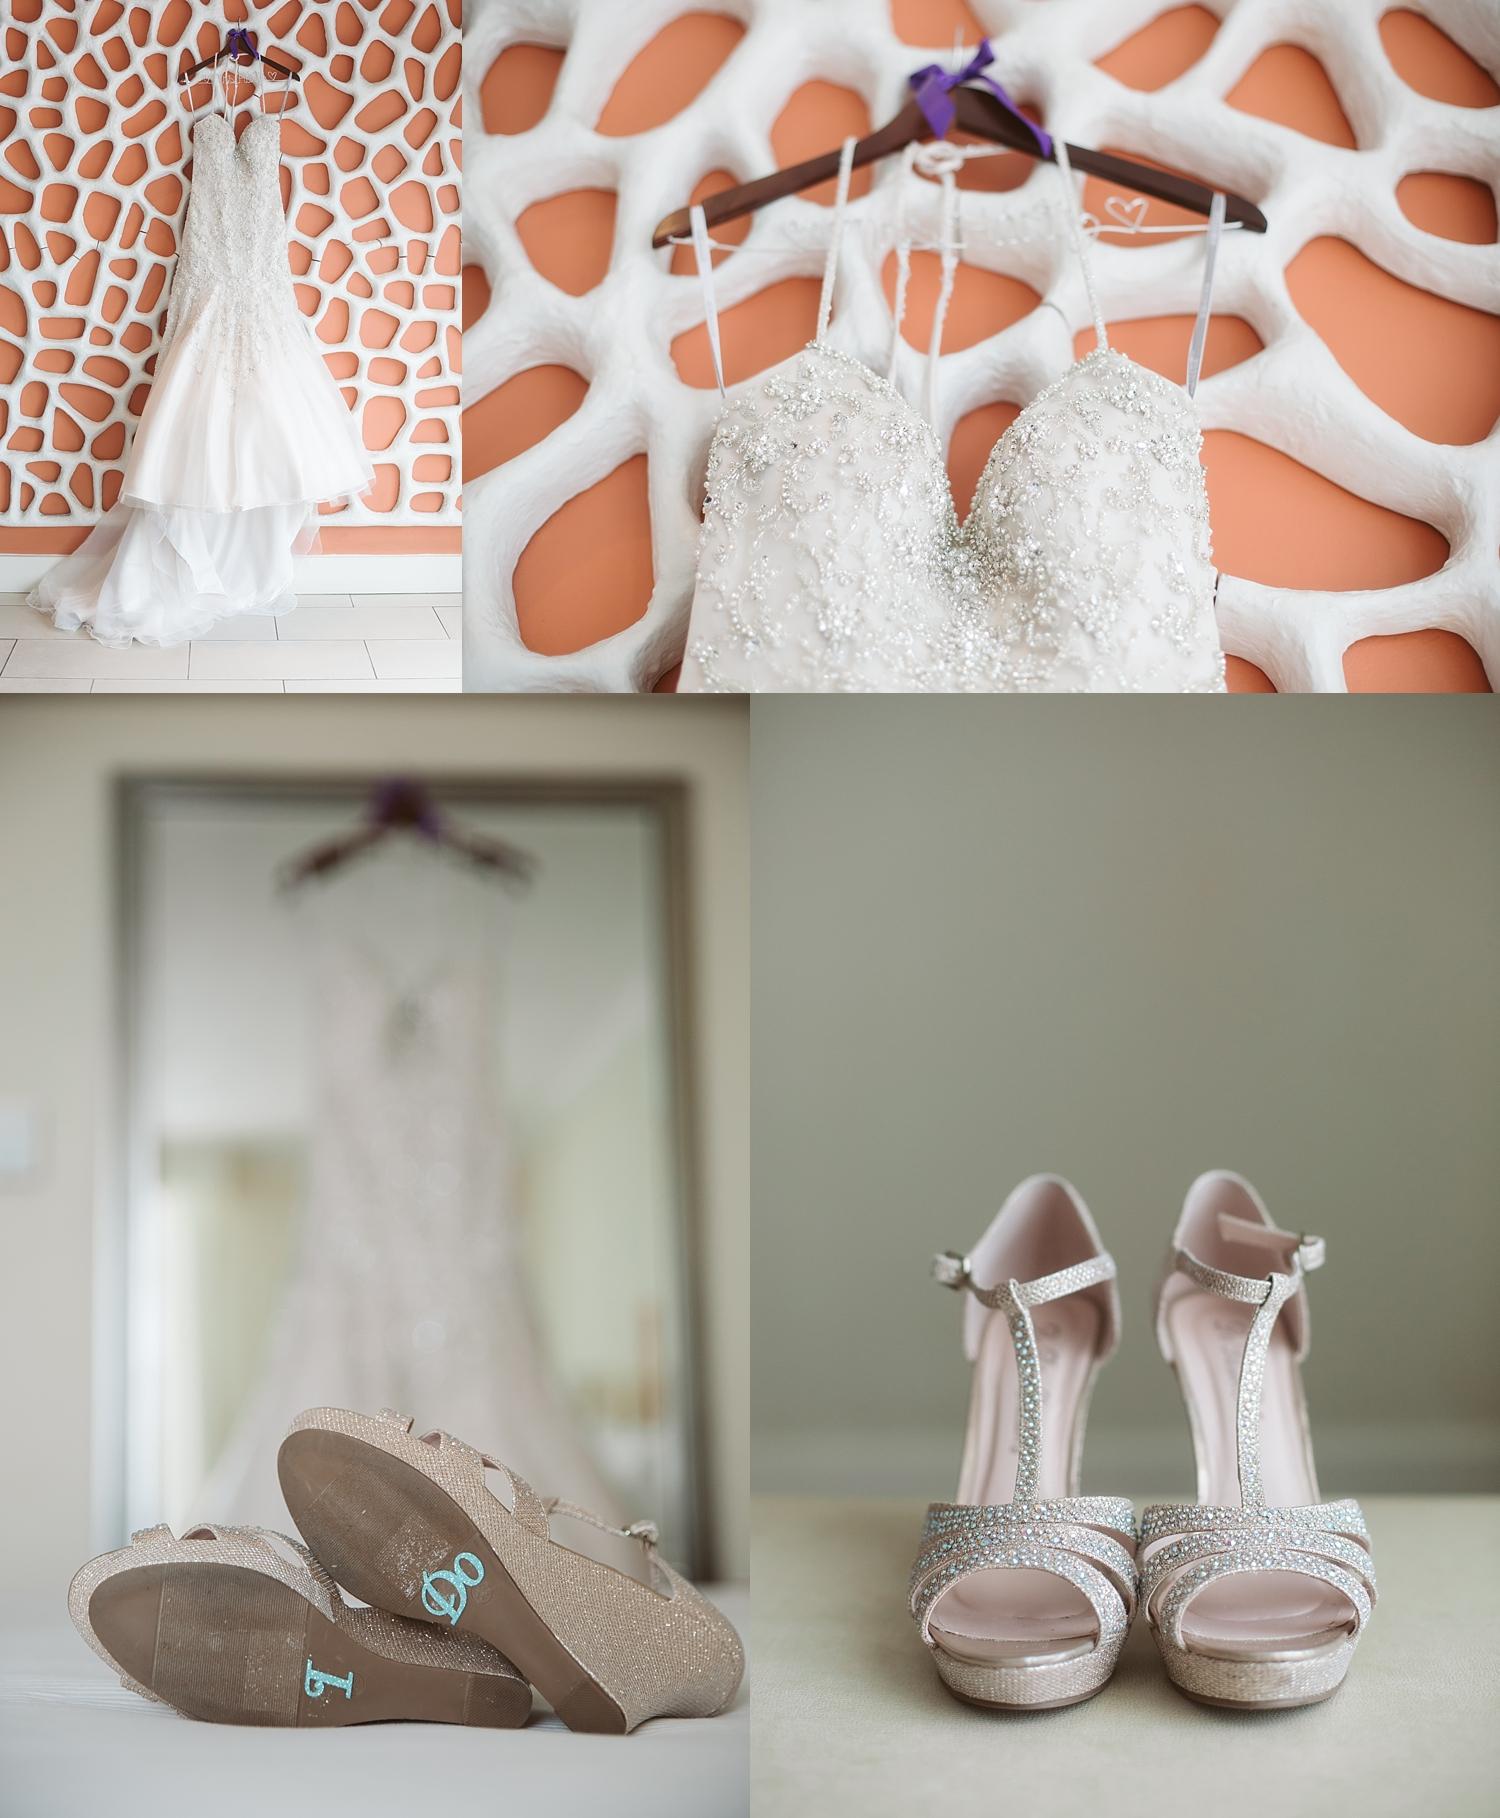 hilton_clearwater_wedding_02.jpg